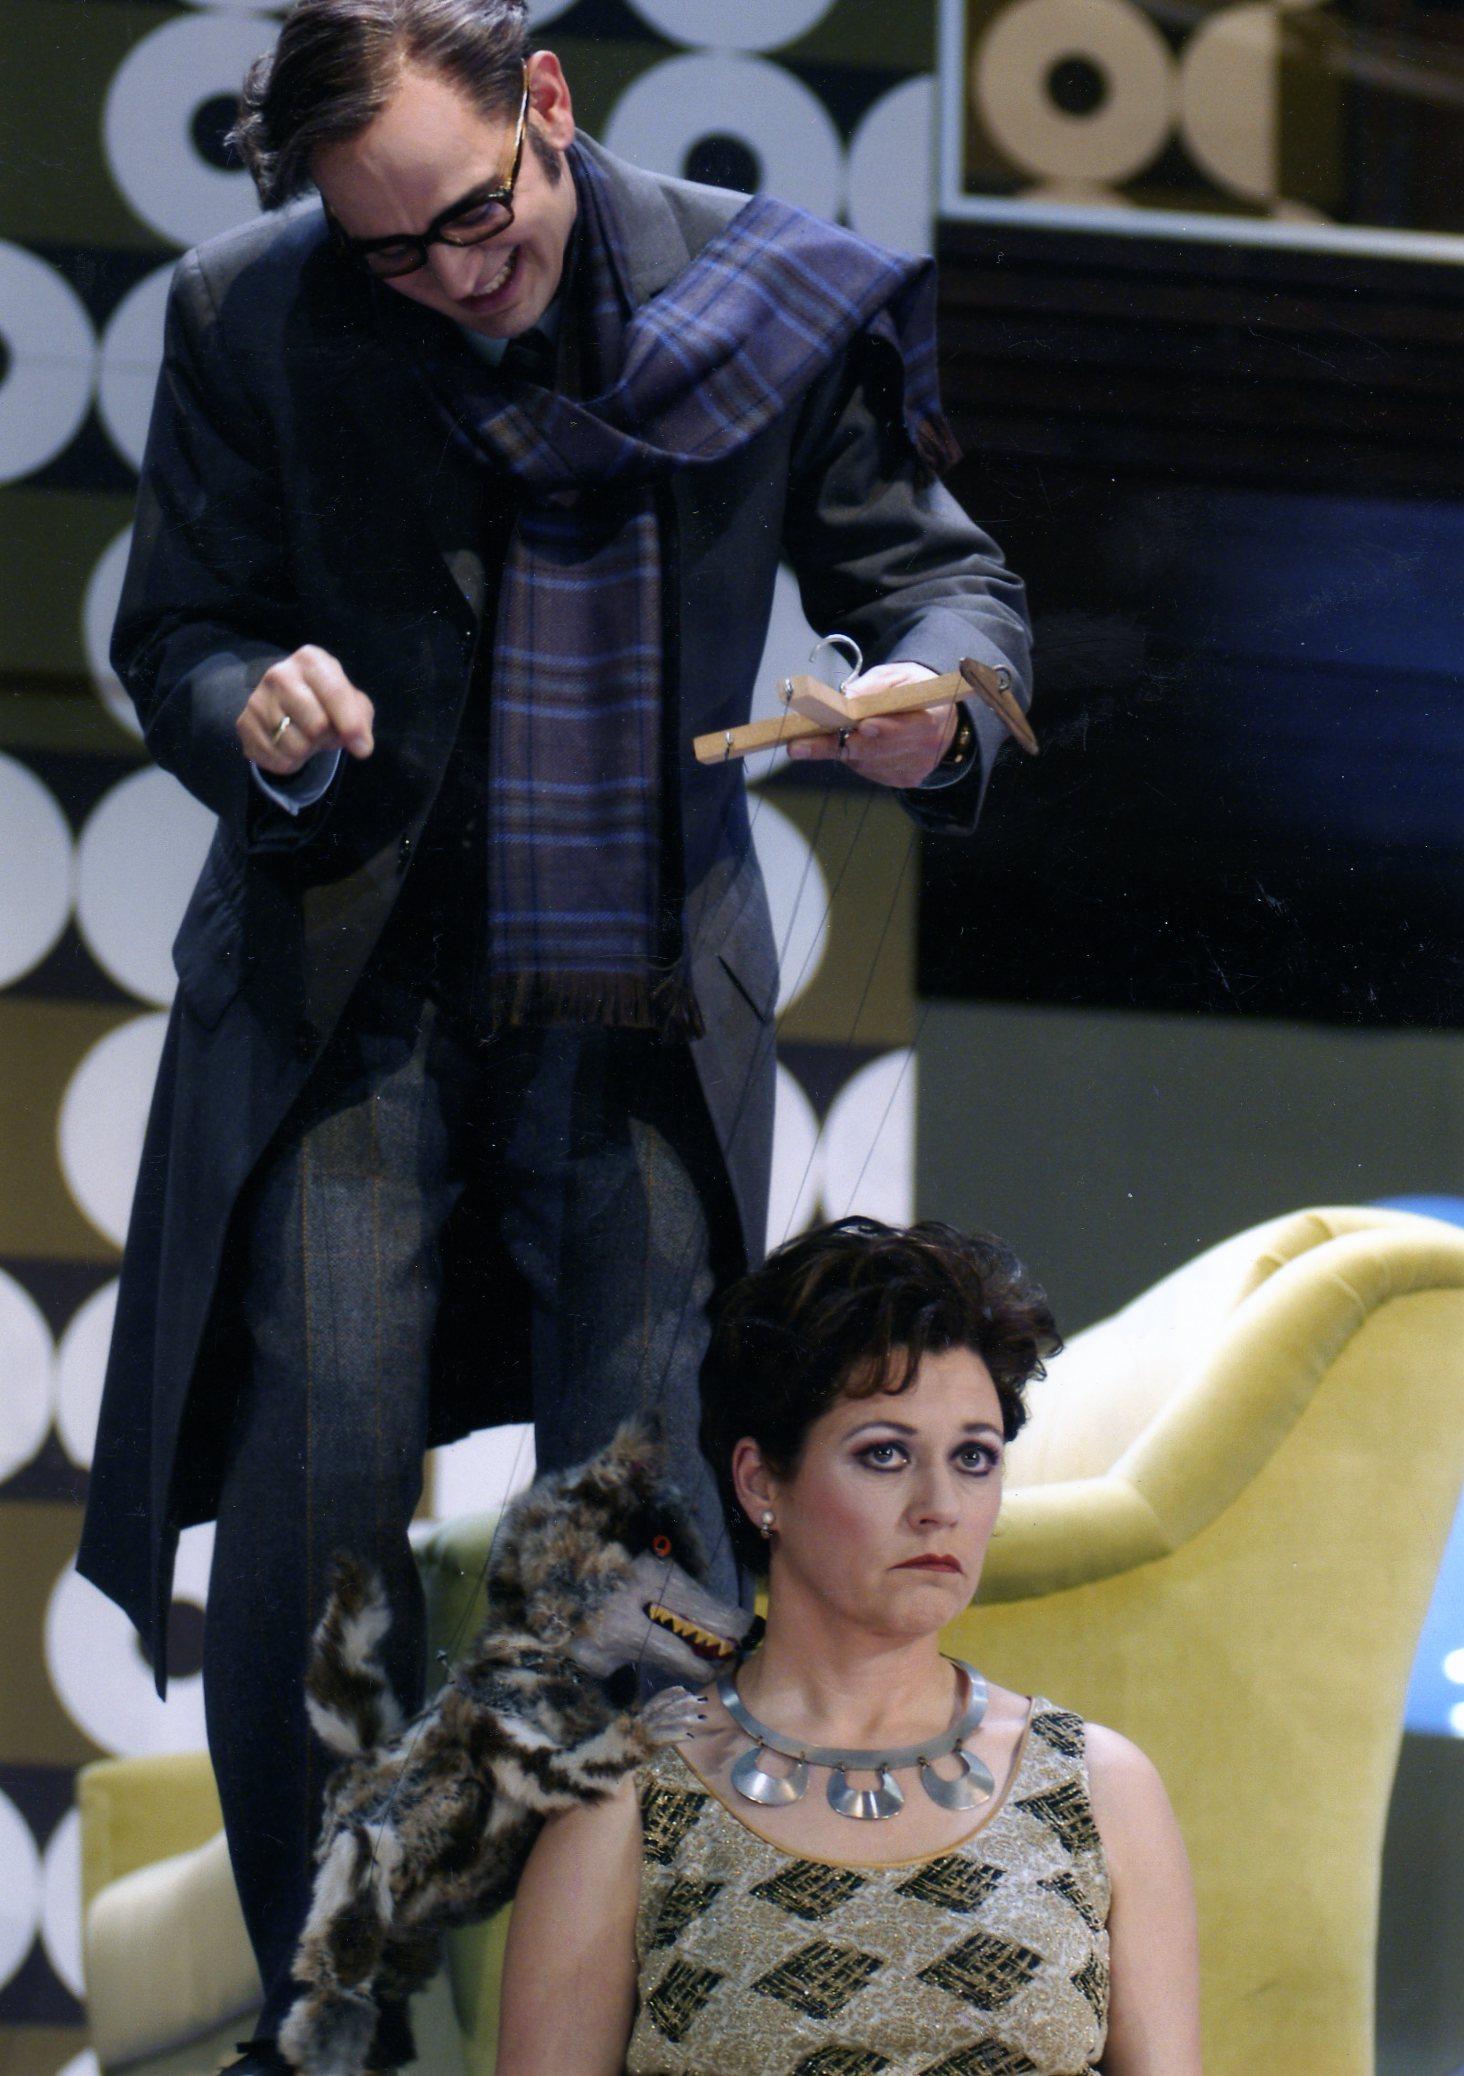 Bettina Römer Schauspielerin 1